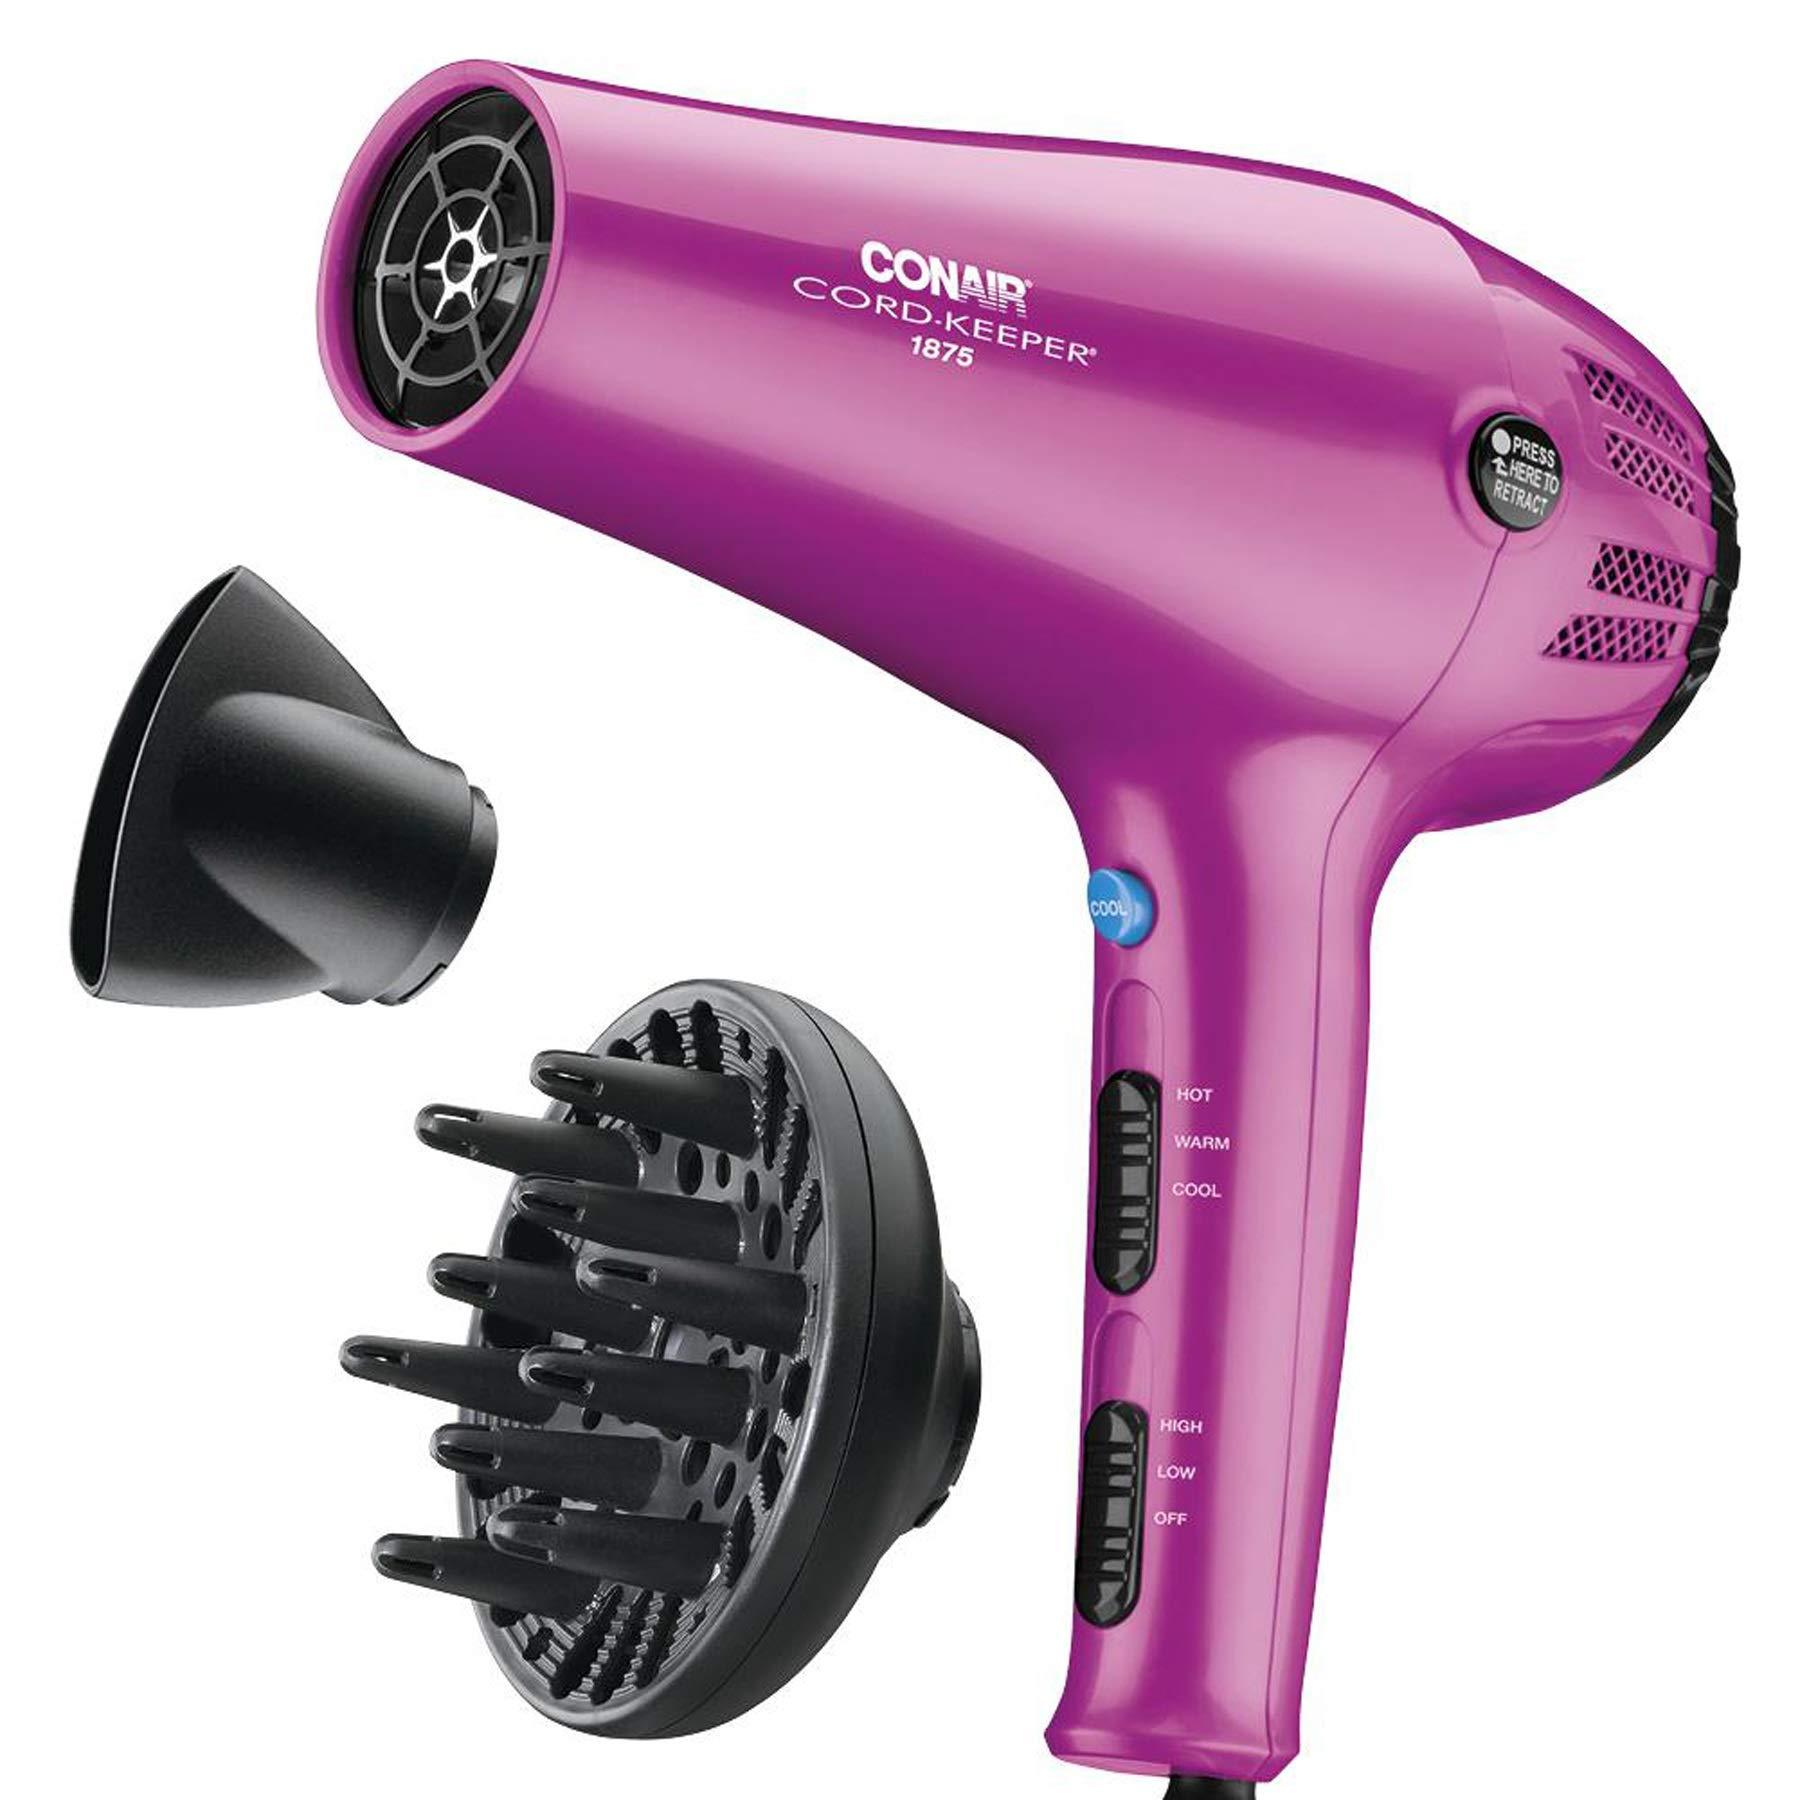 Conair 1875 Watt Cord-Keeper Hair Dryer; Pink by Conair